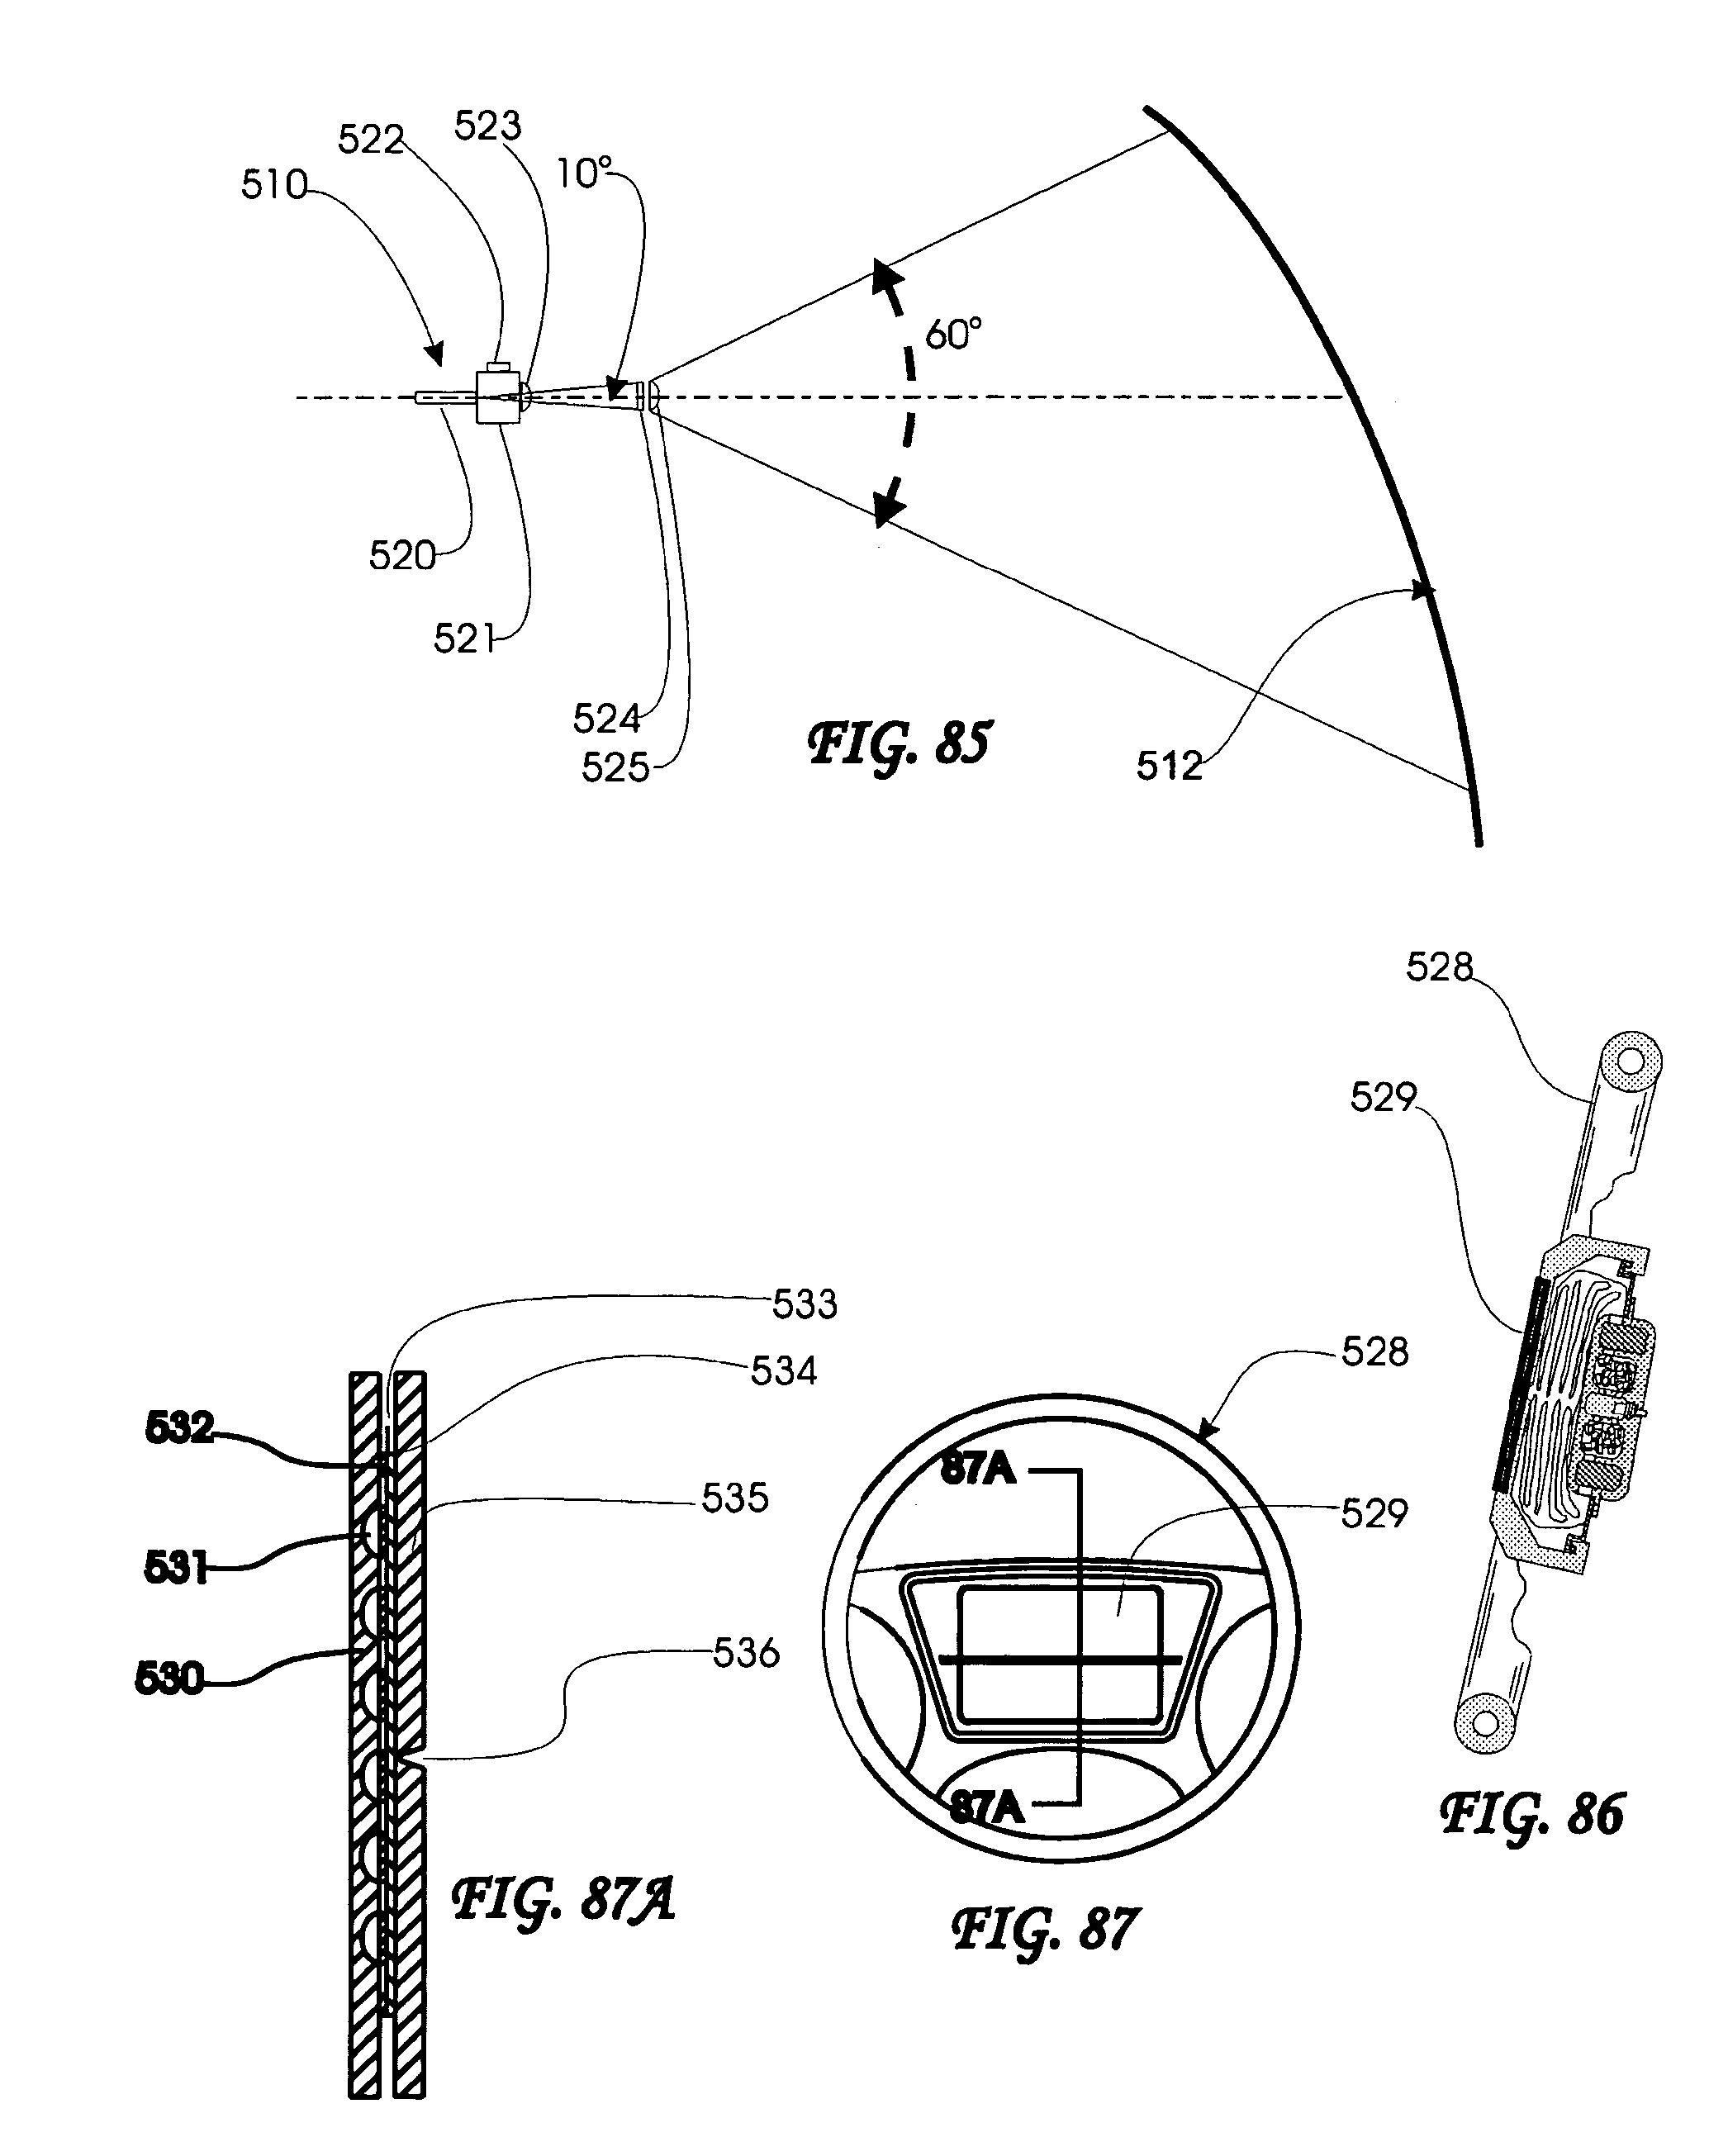 boiler hookup diagrams